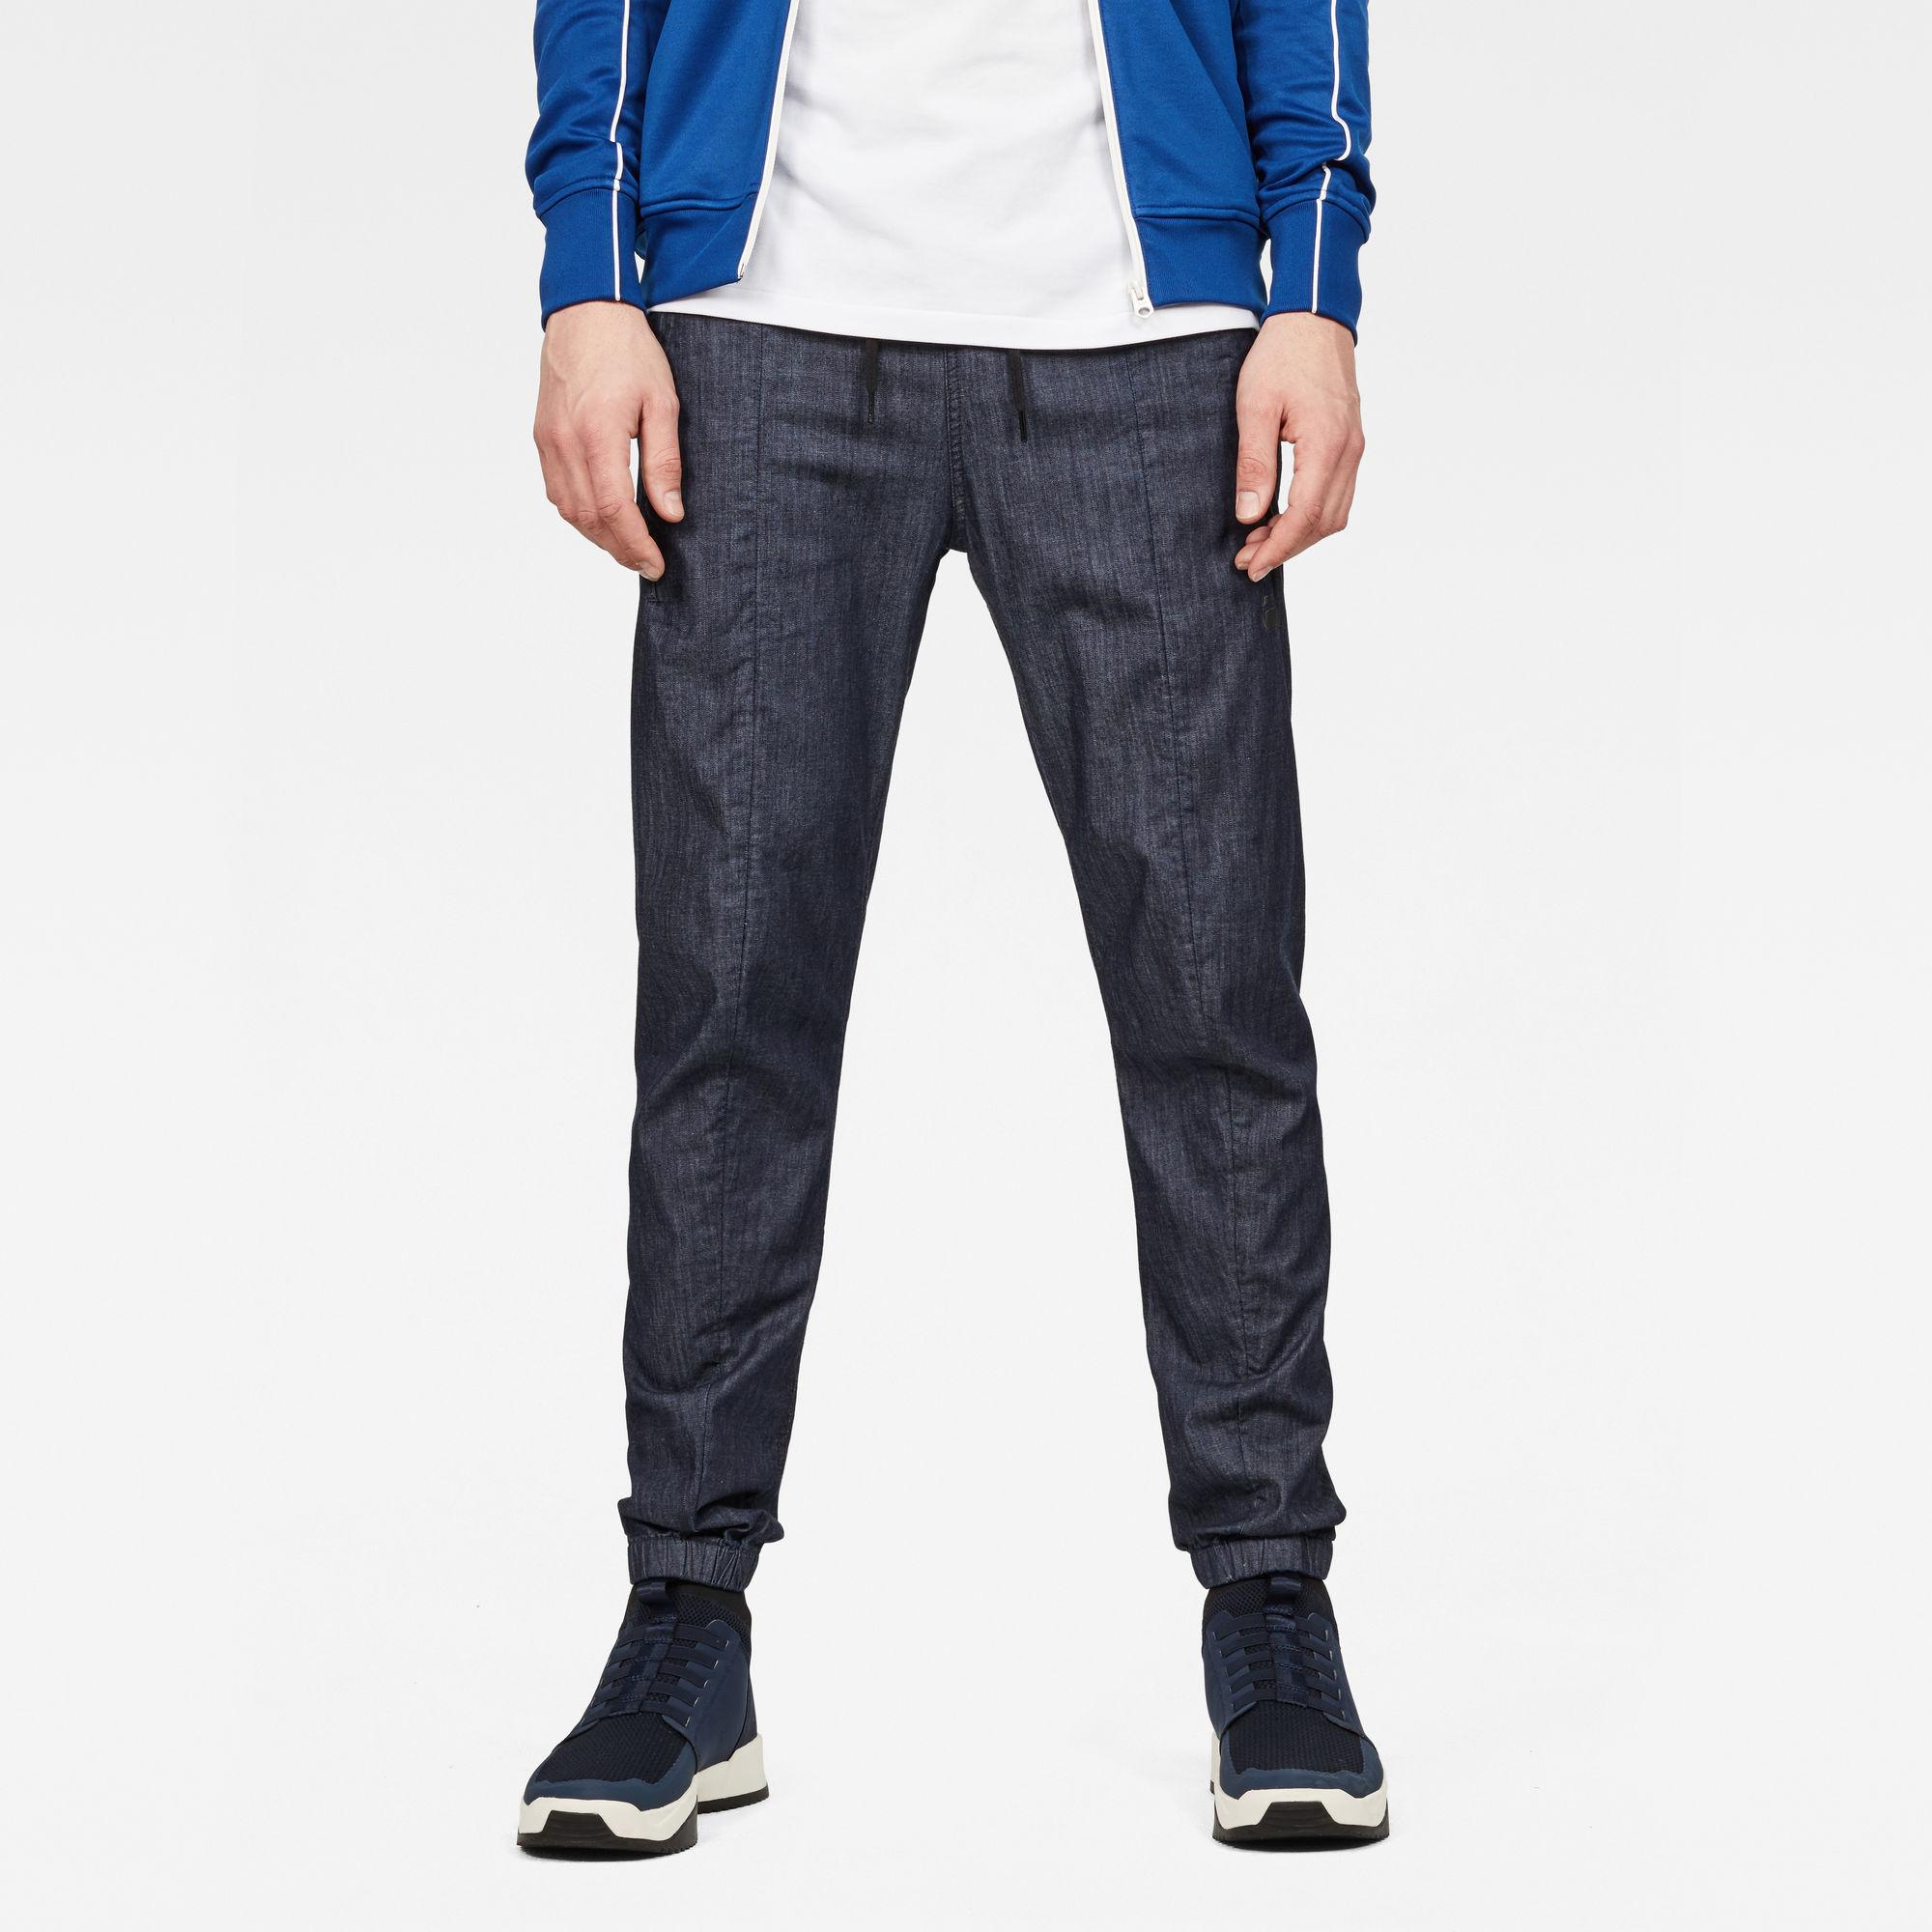 Image of G Star Raw Lanc Straight Cuffed Jeans